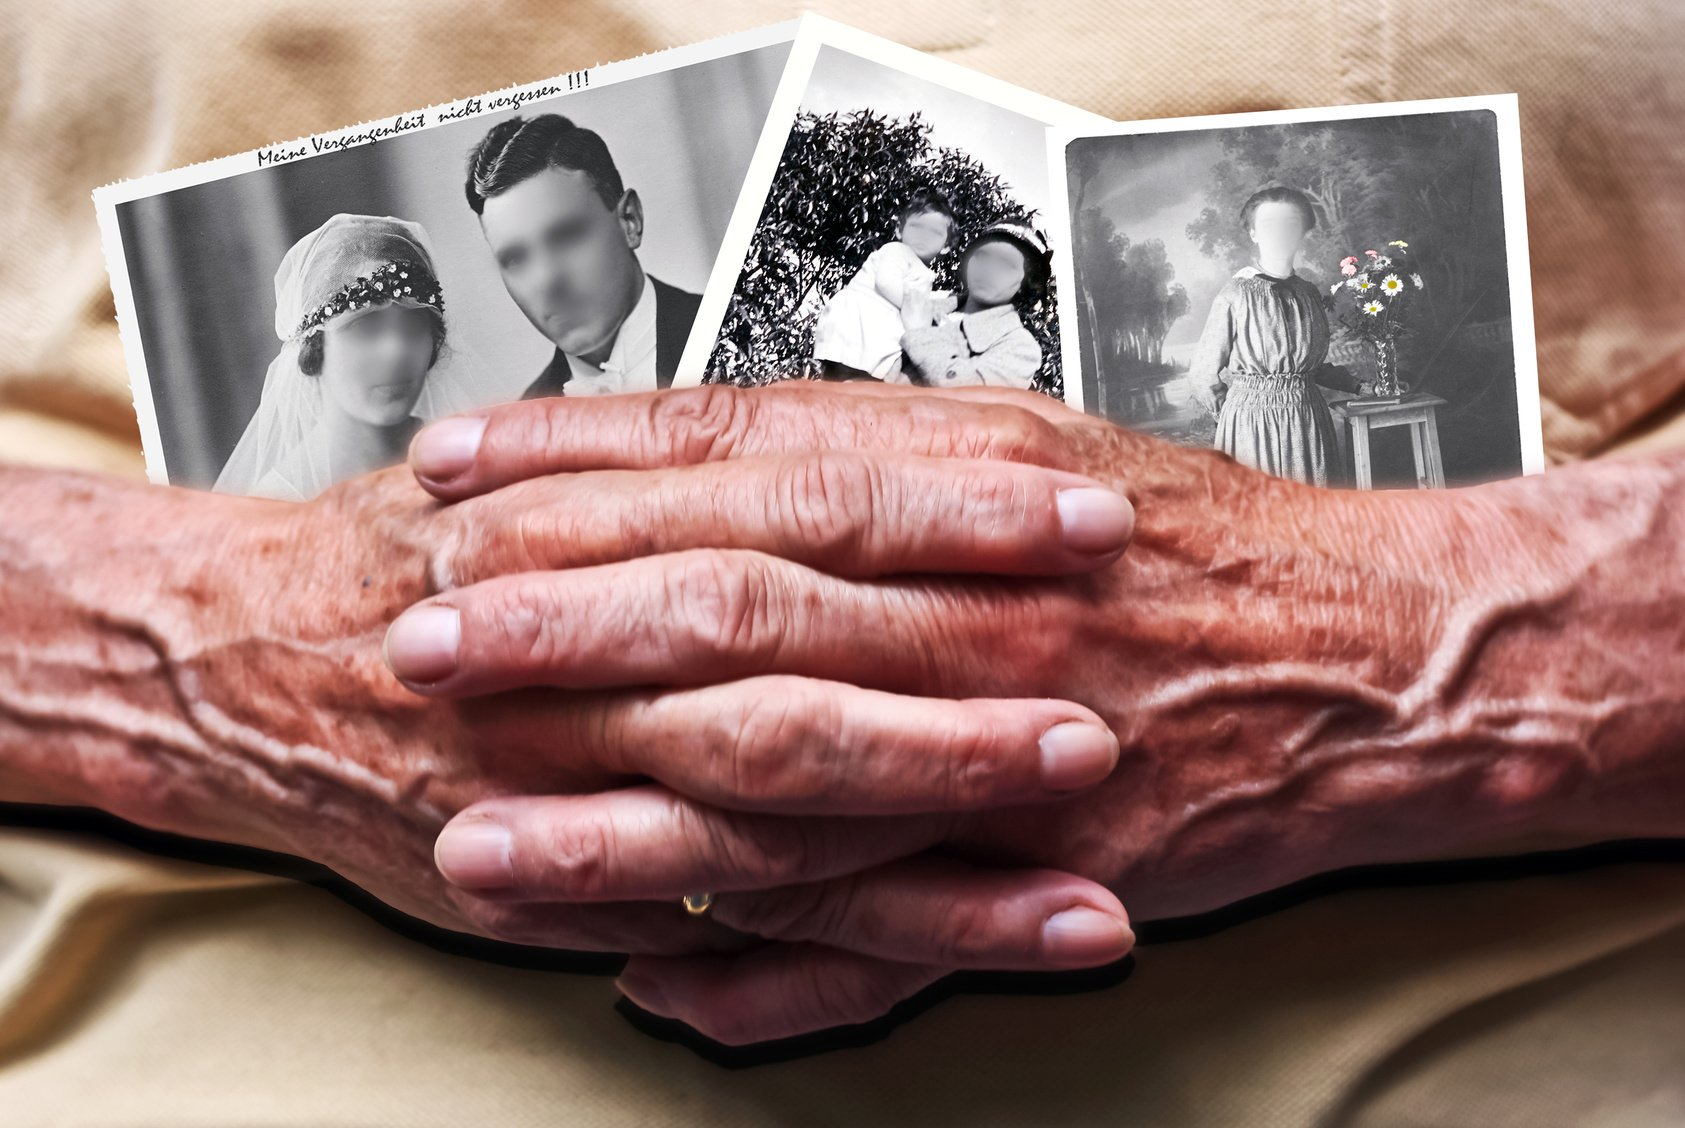 Coronavirus, neurologi: Lockdown può far peggiorare malati Alzheimer